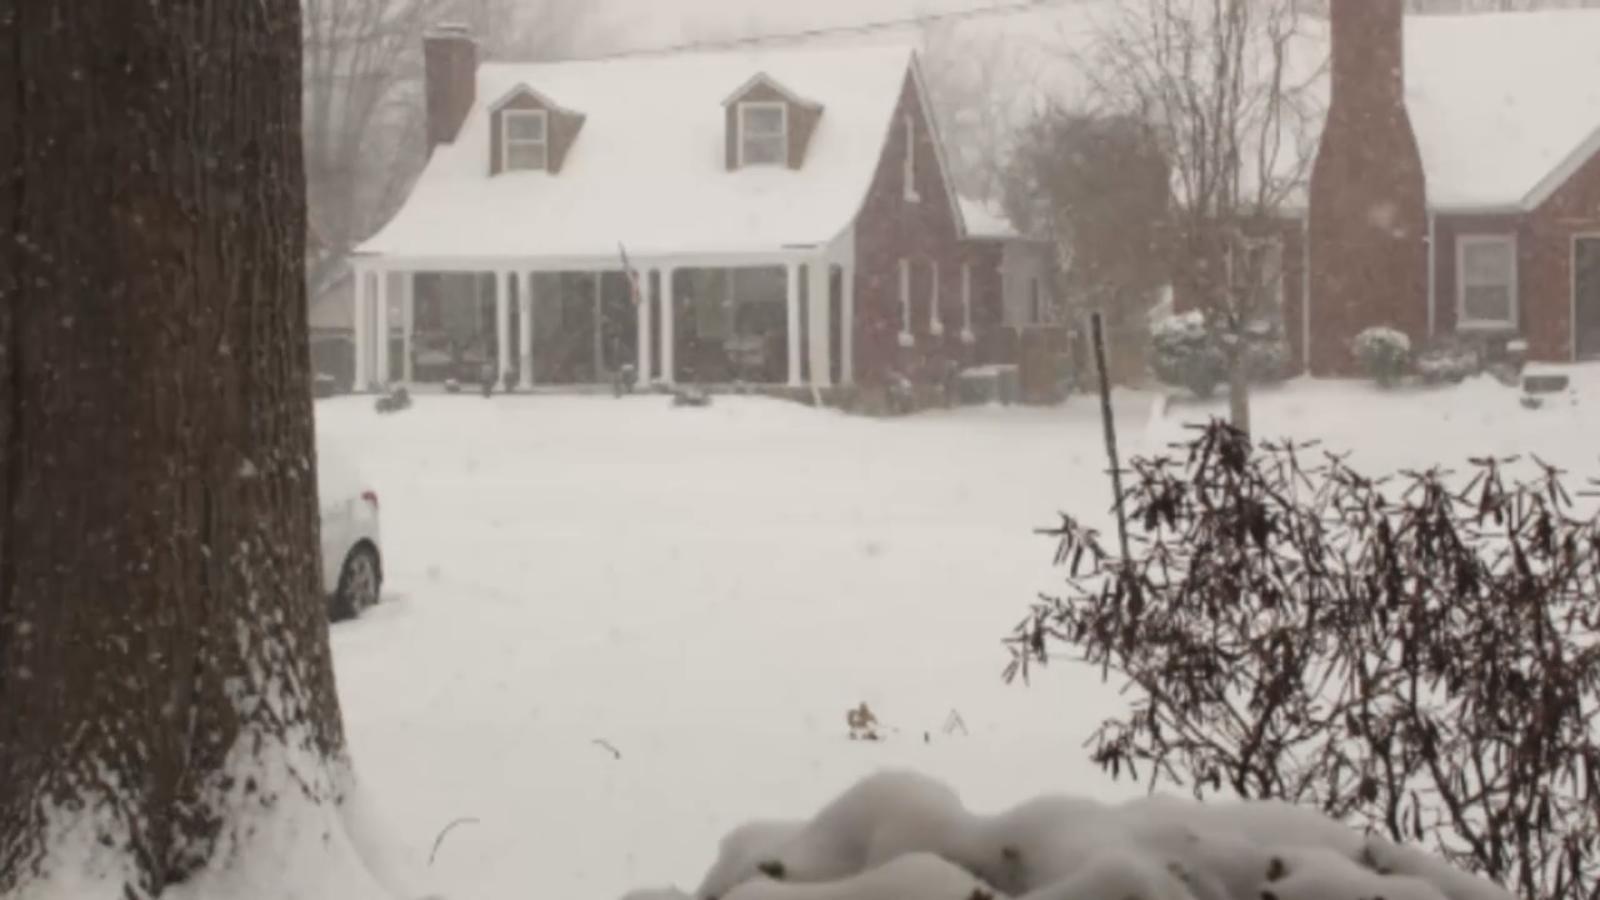 Meteorologist predicts snow this weekend